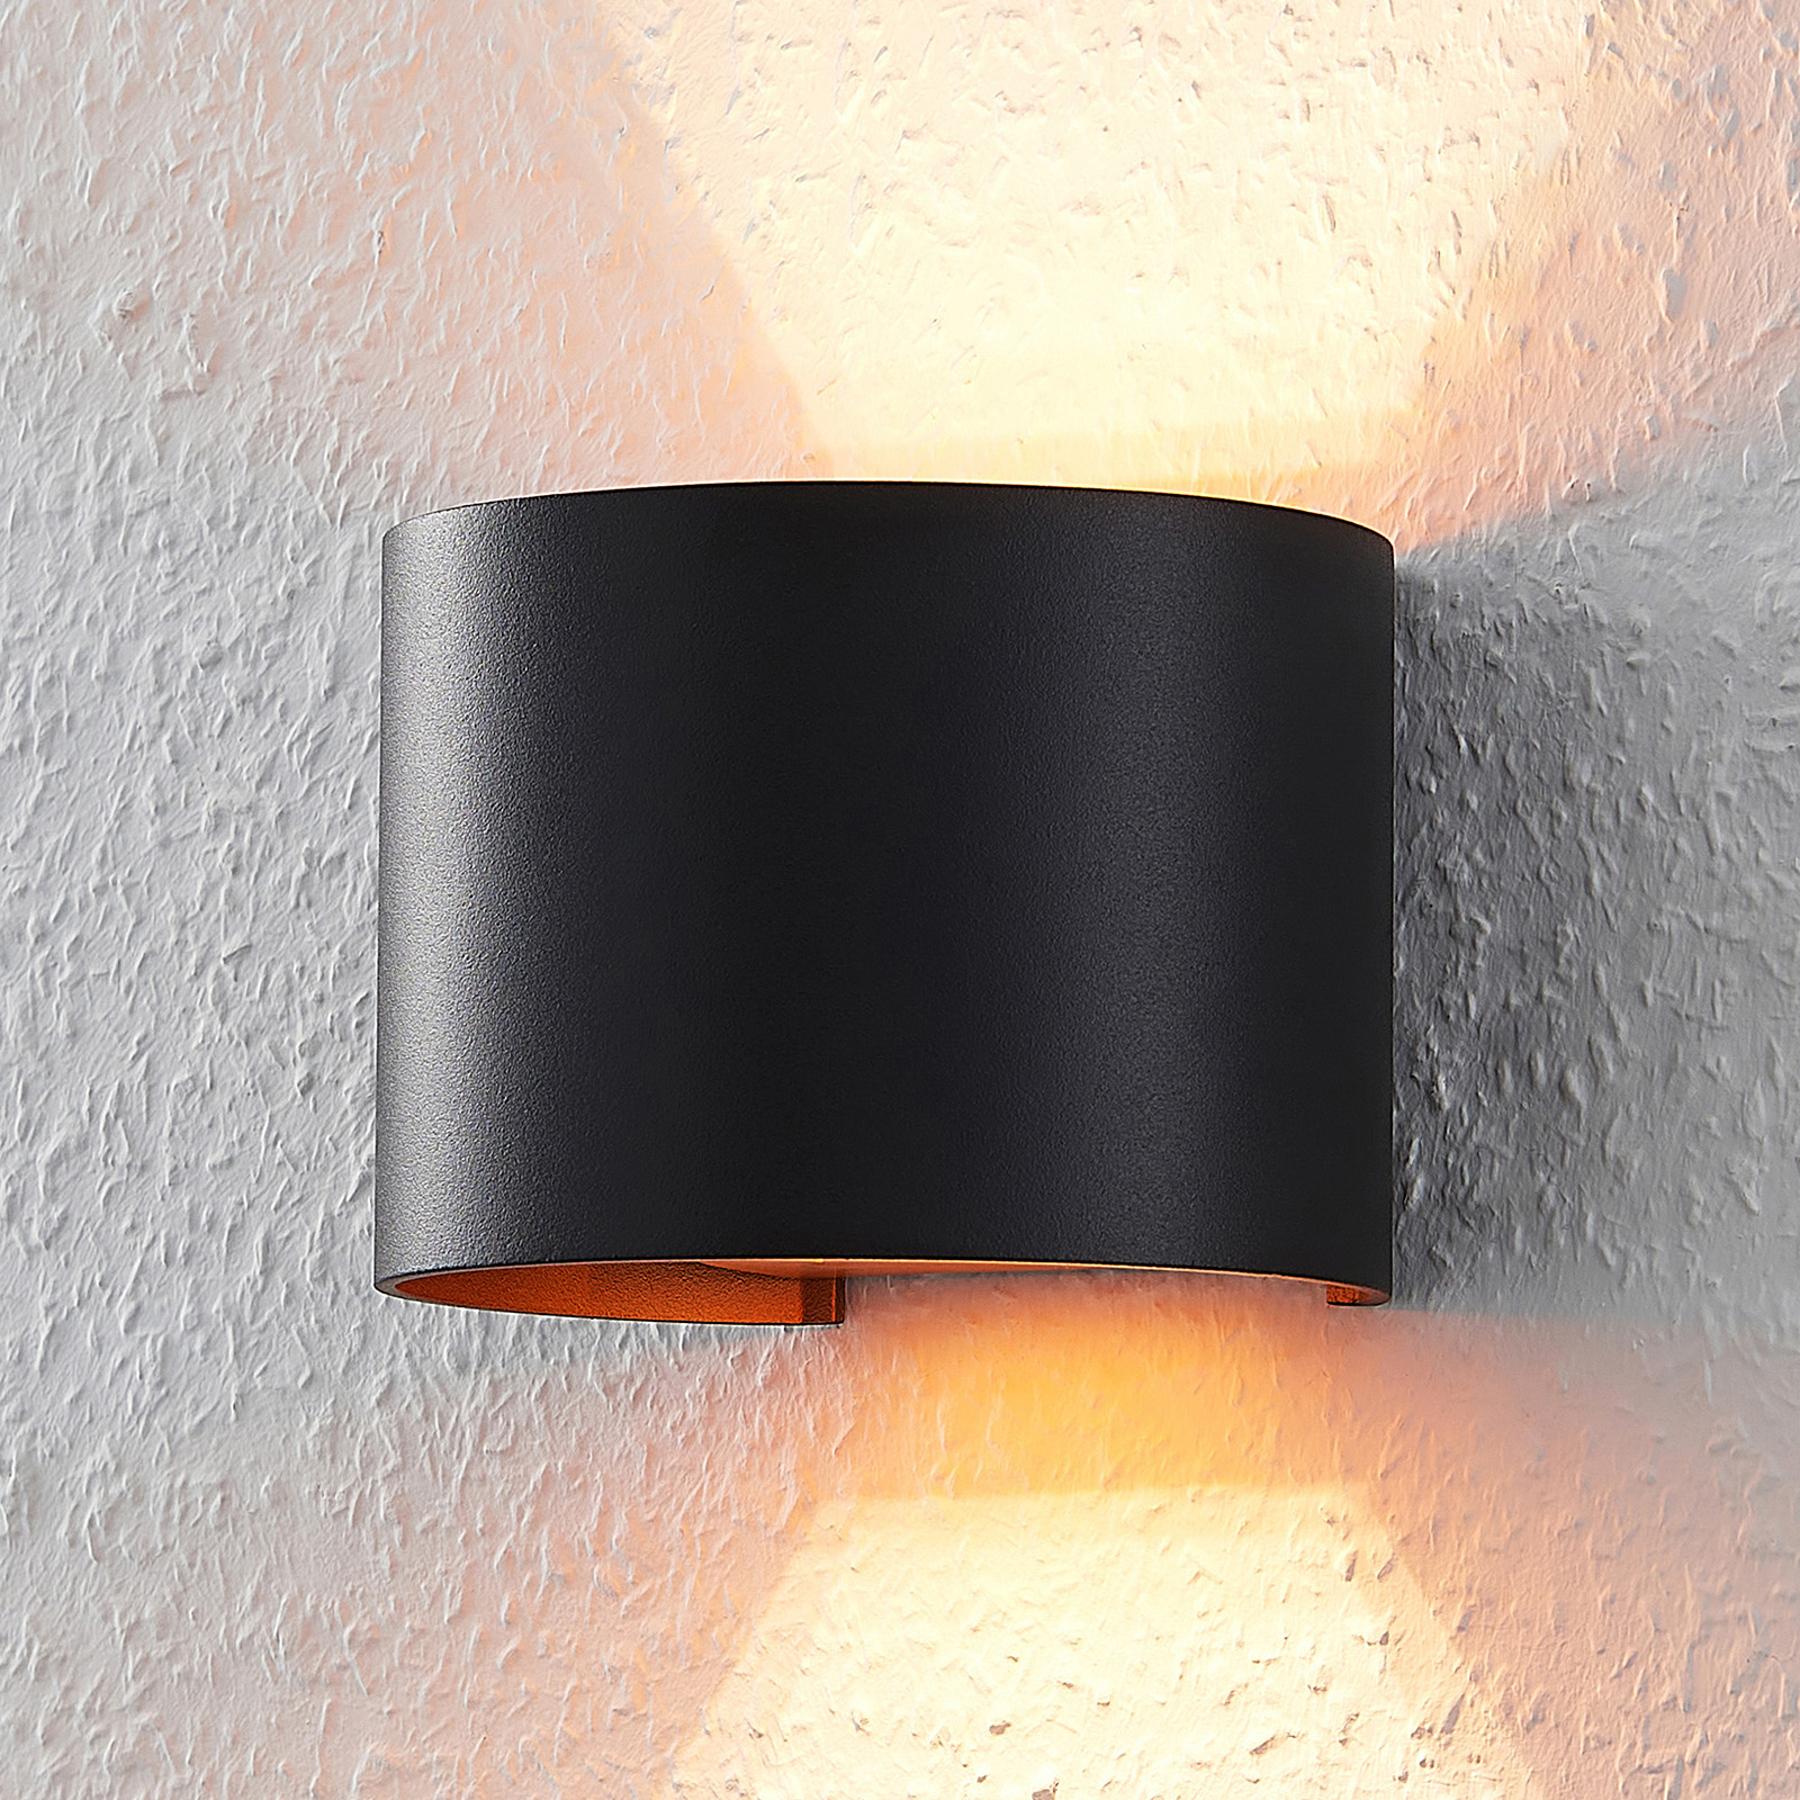 Zwart-gouden LED wandlamp Zuzana, G9